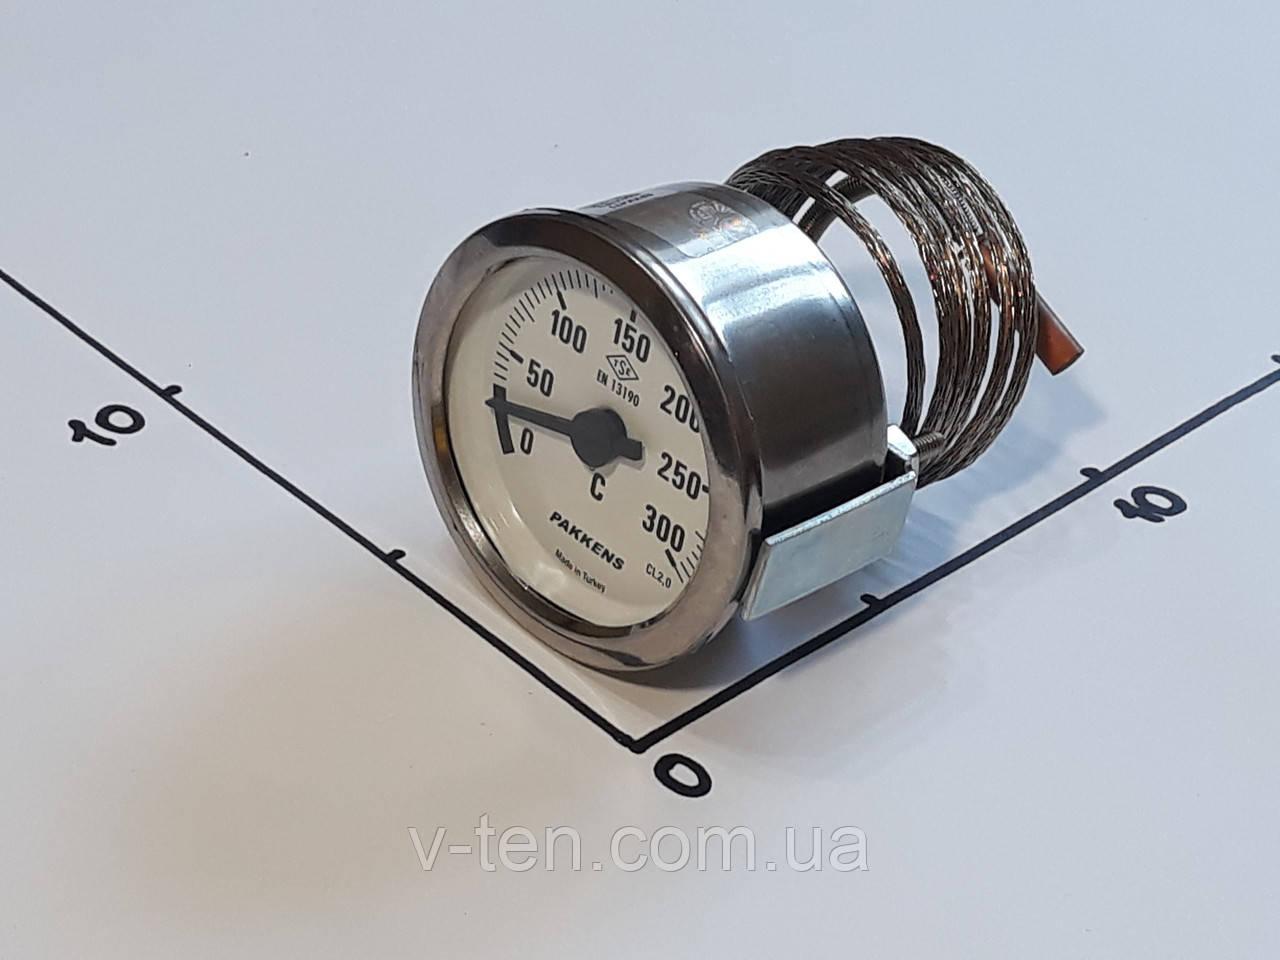 Термометр капиллярный Ø60мм / 300°С / L-100 cм PAKKENS (Турция)